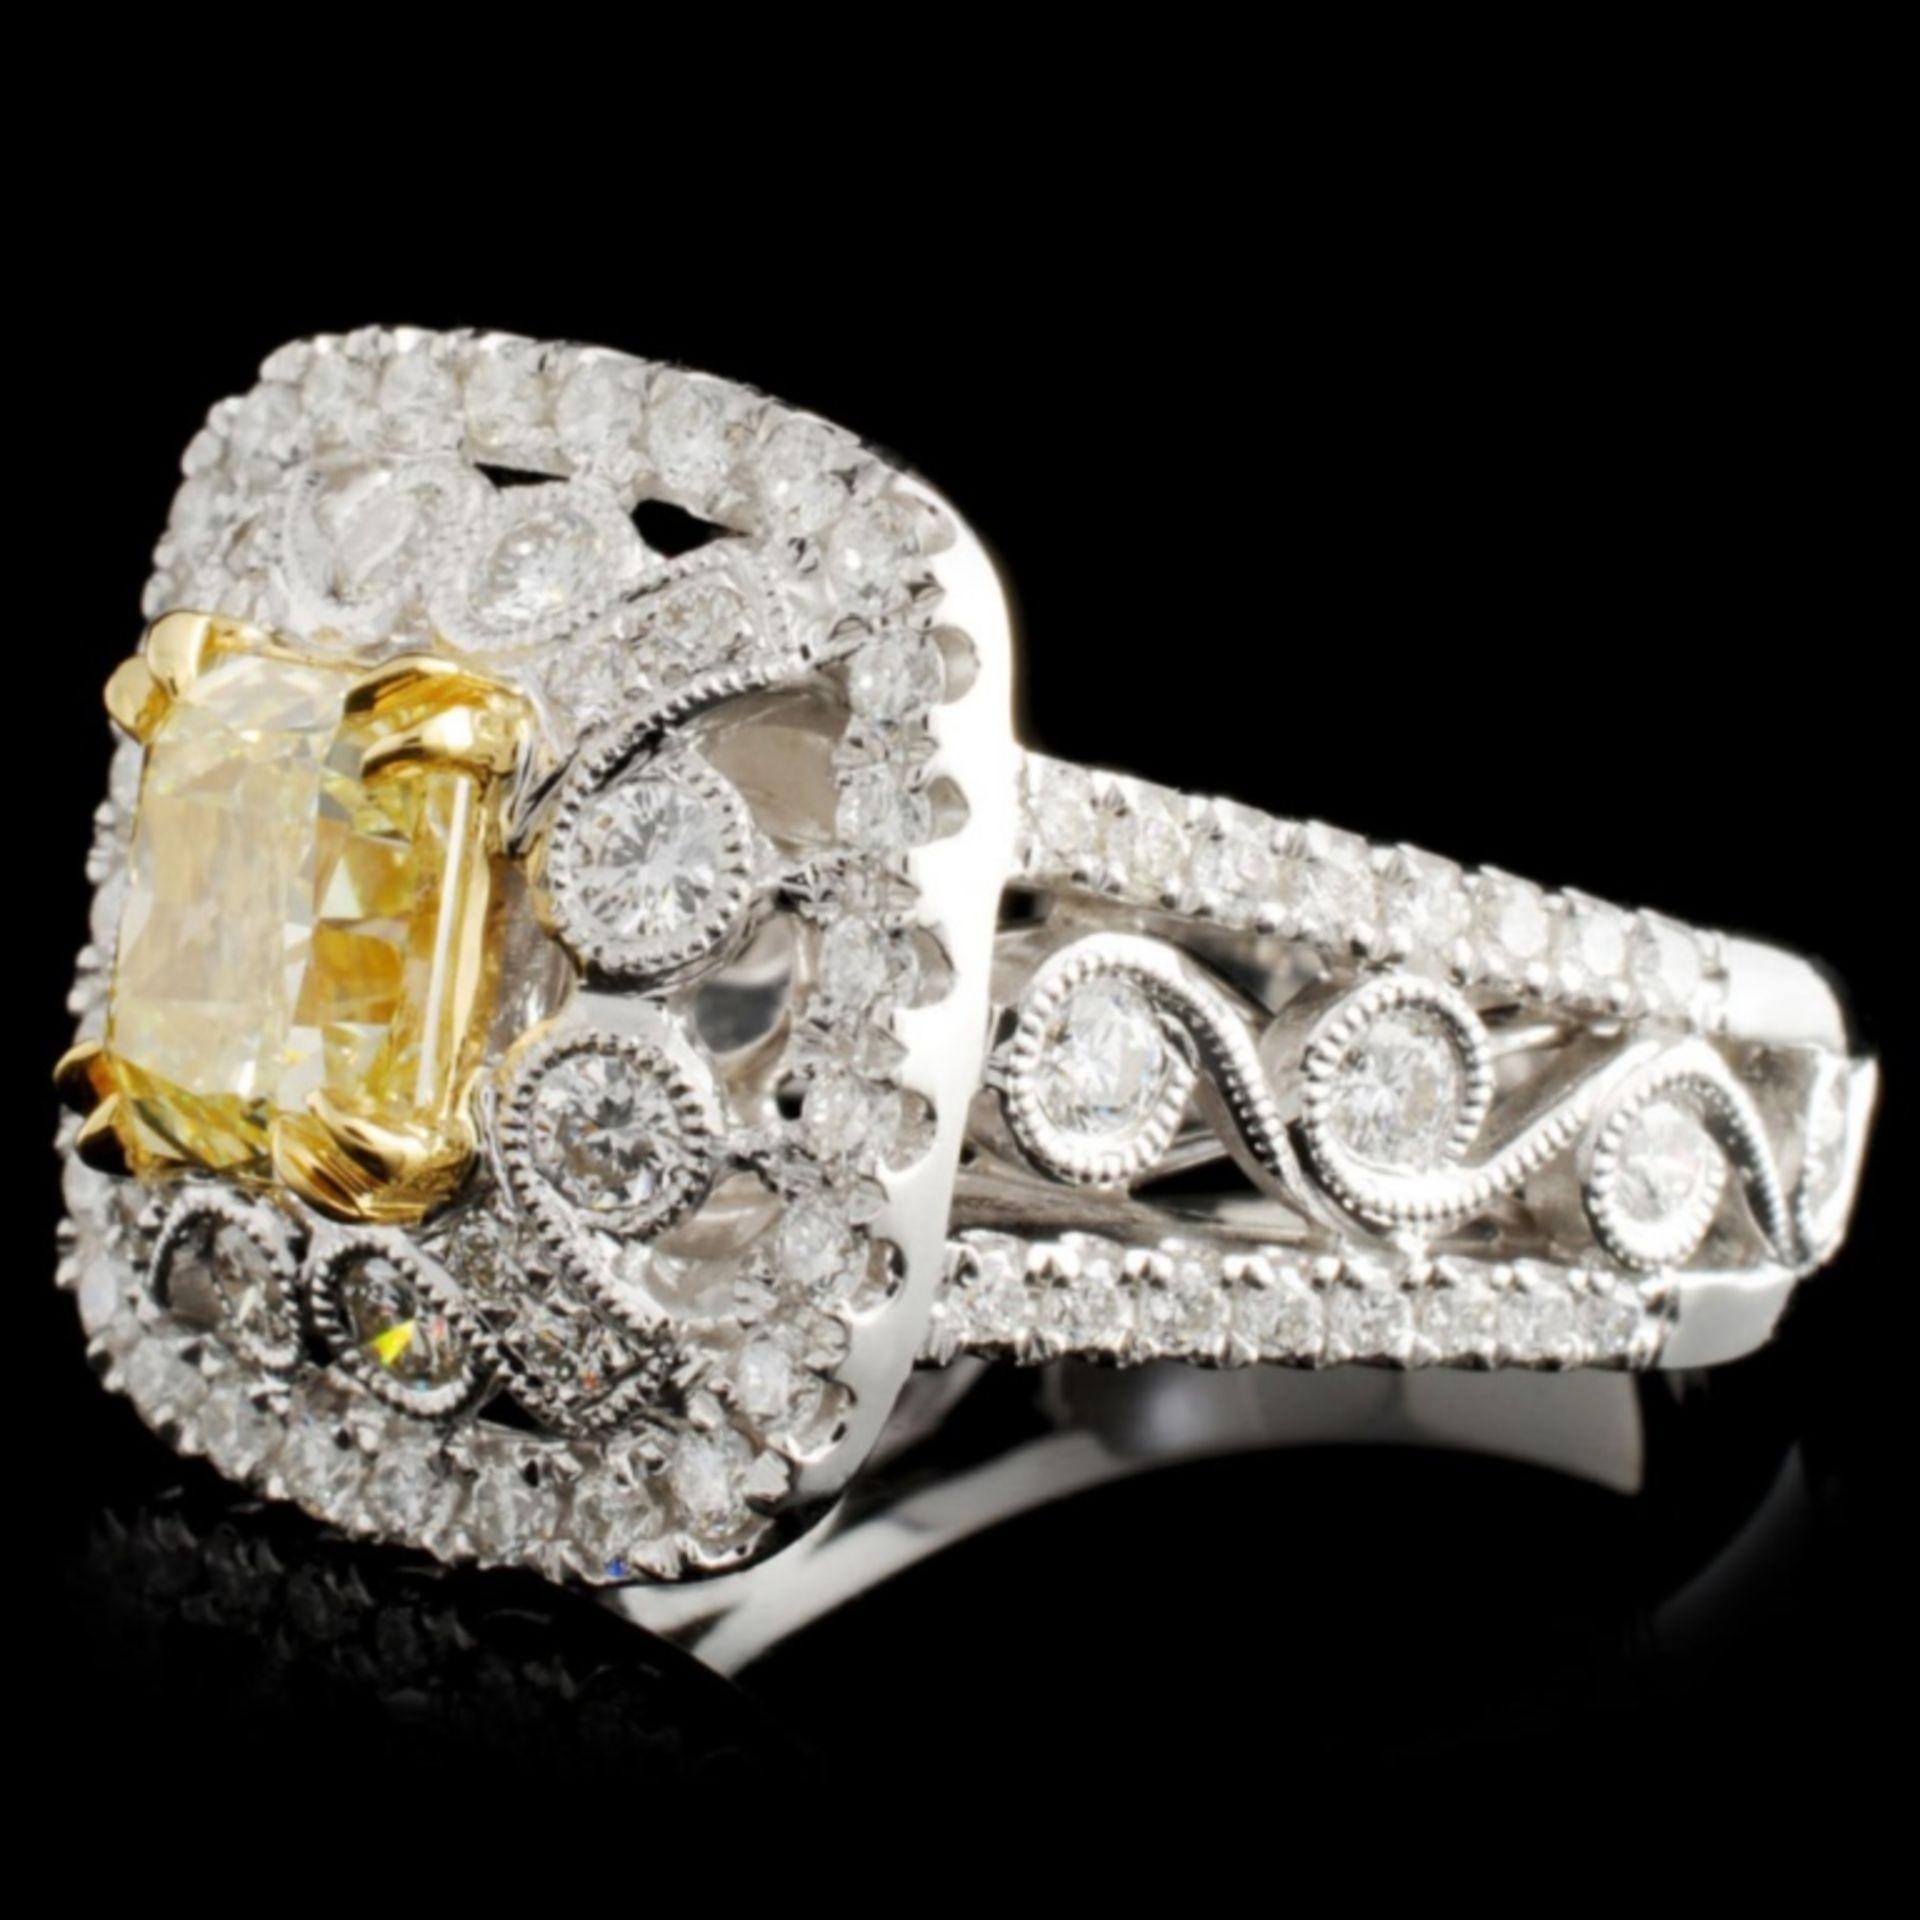 18K Gold 2.74ctw Fancy Diamond Ring - Image 2 of 4